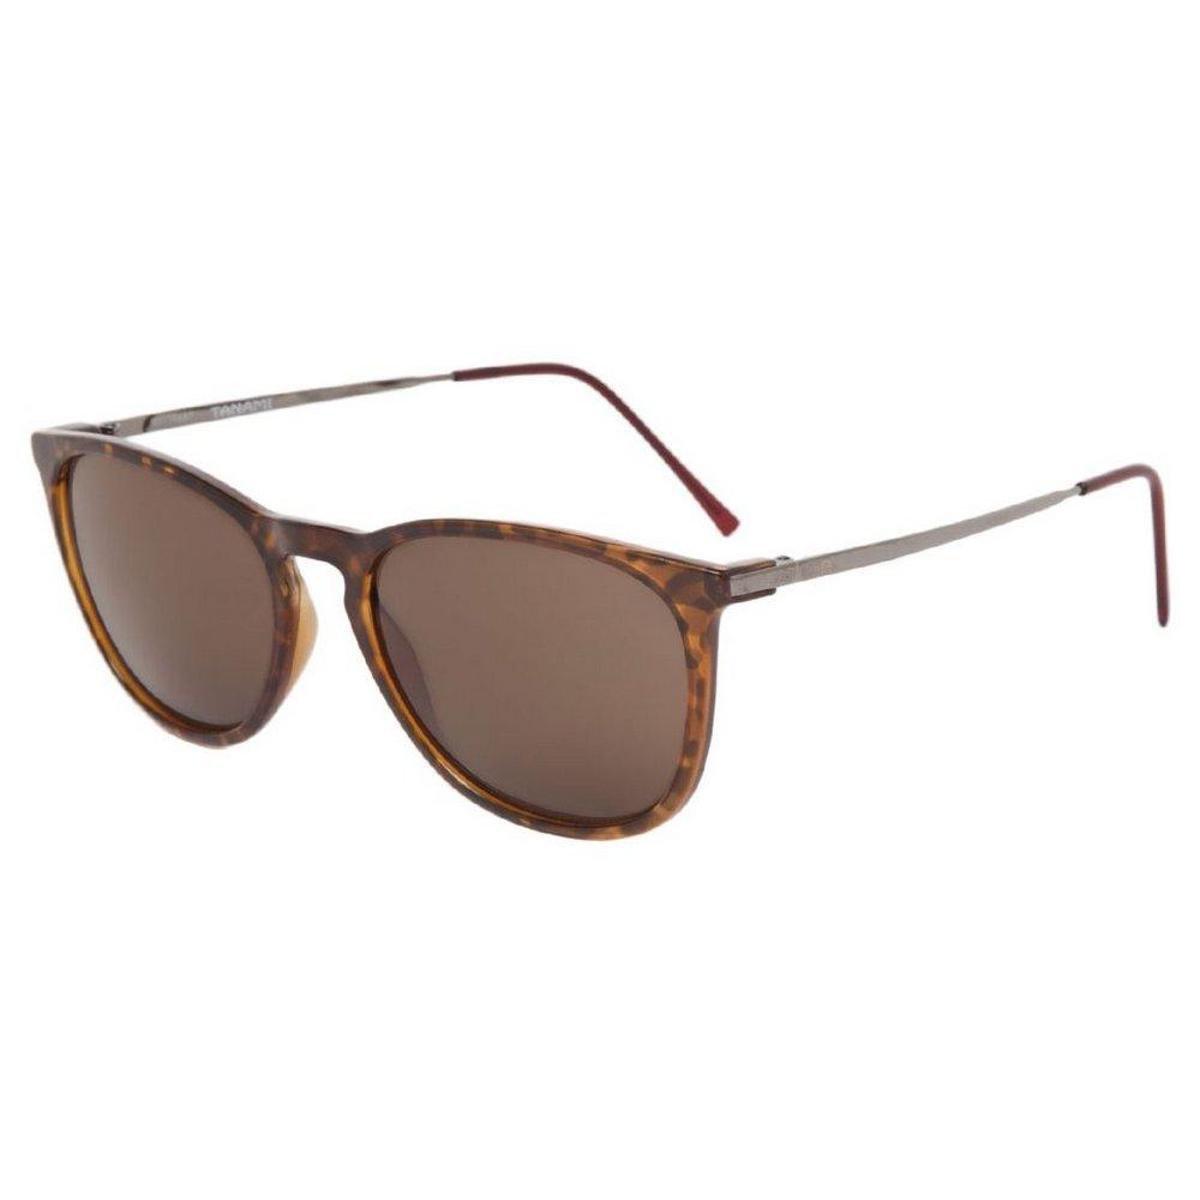 Óculos de Sol HB Tanami - Marrom - Compre Agora   Netshoes 4099cd9517